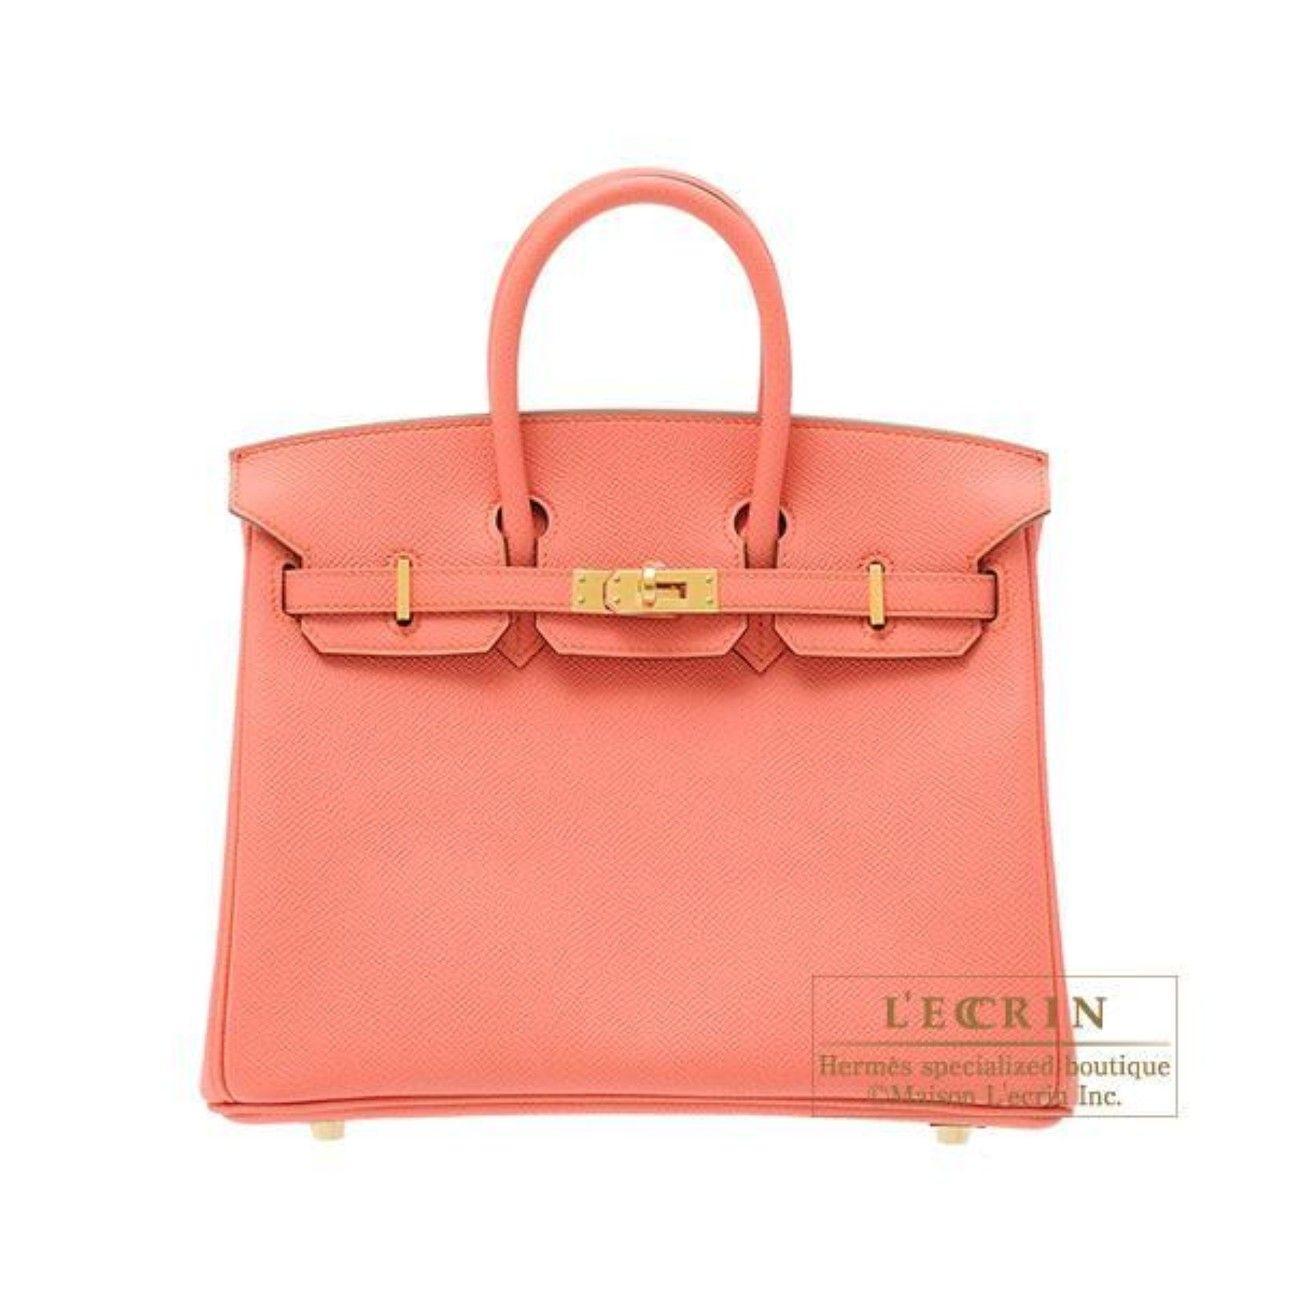 Hermes Birkin bag 25 Flamingo Epsom Leather Gold hardware from Discountpluss | Square Market